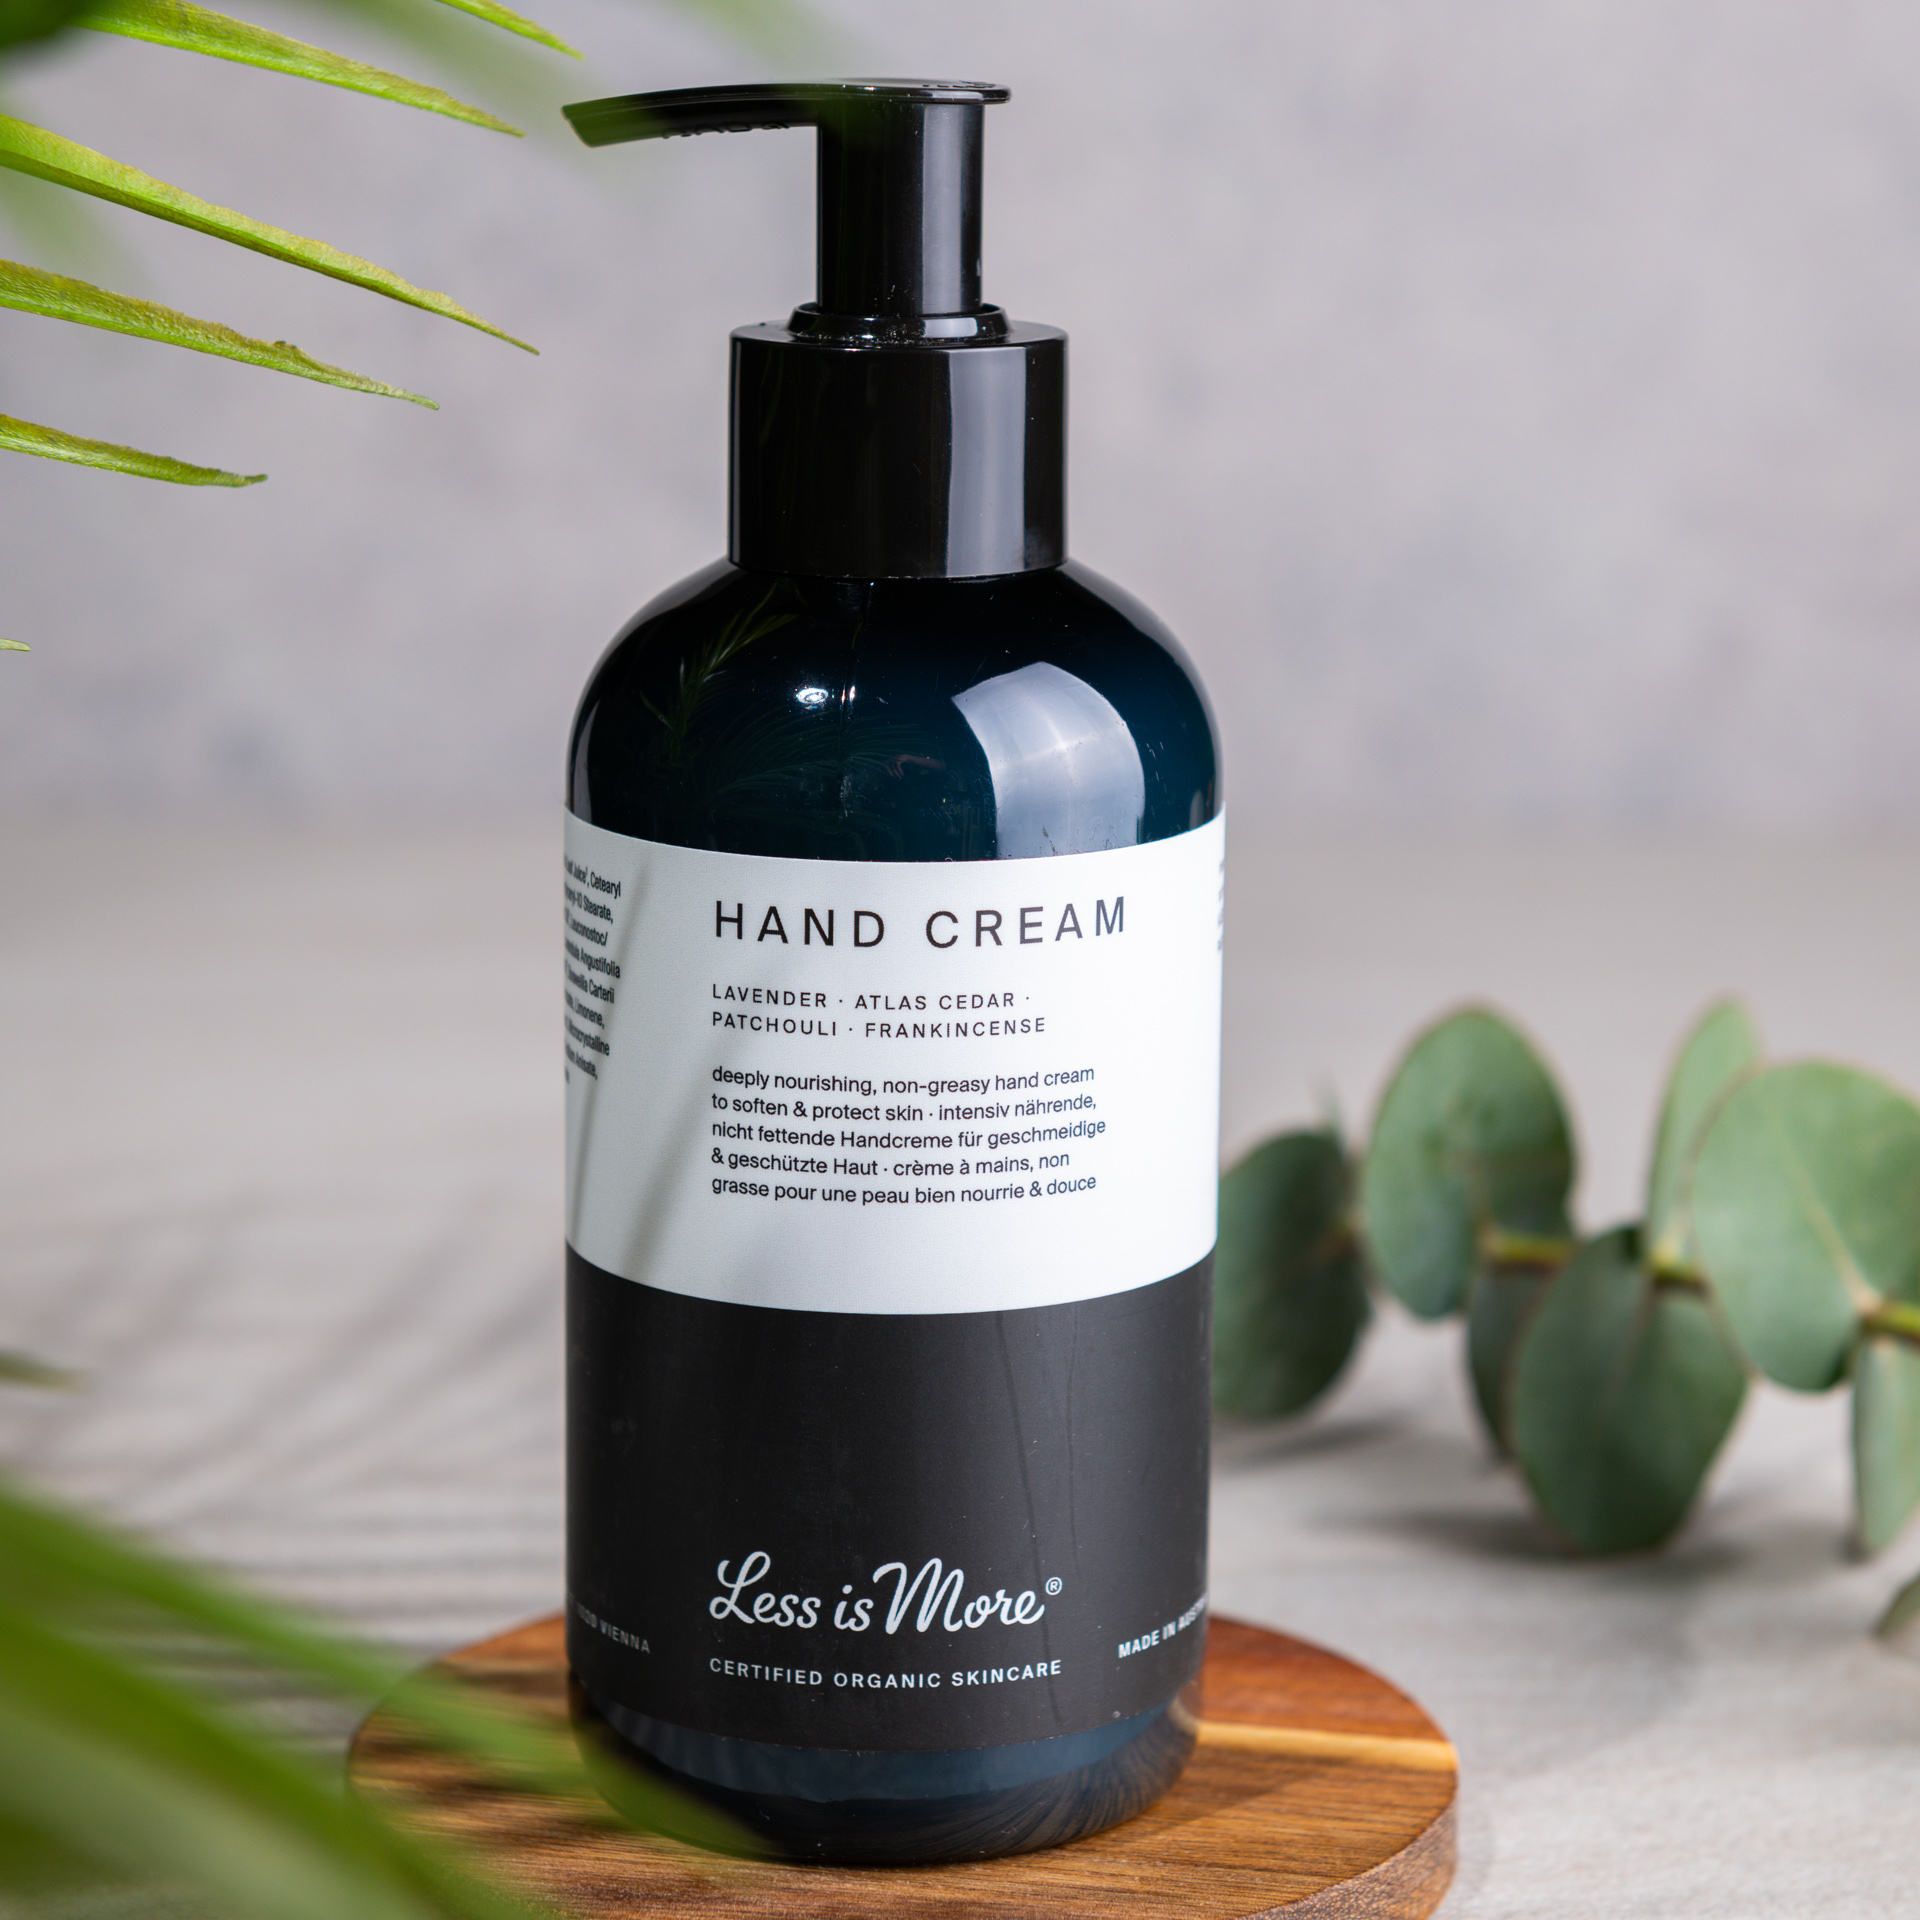 Hand Cream Lavender · Atlas Cedar · Patchouli · Frankincense